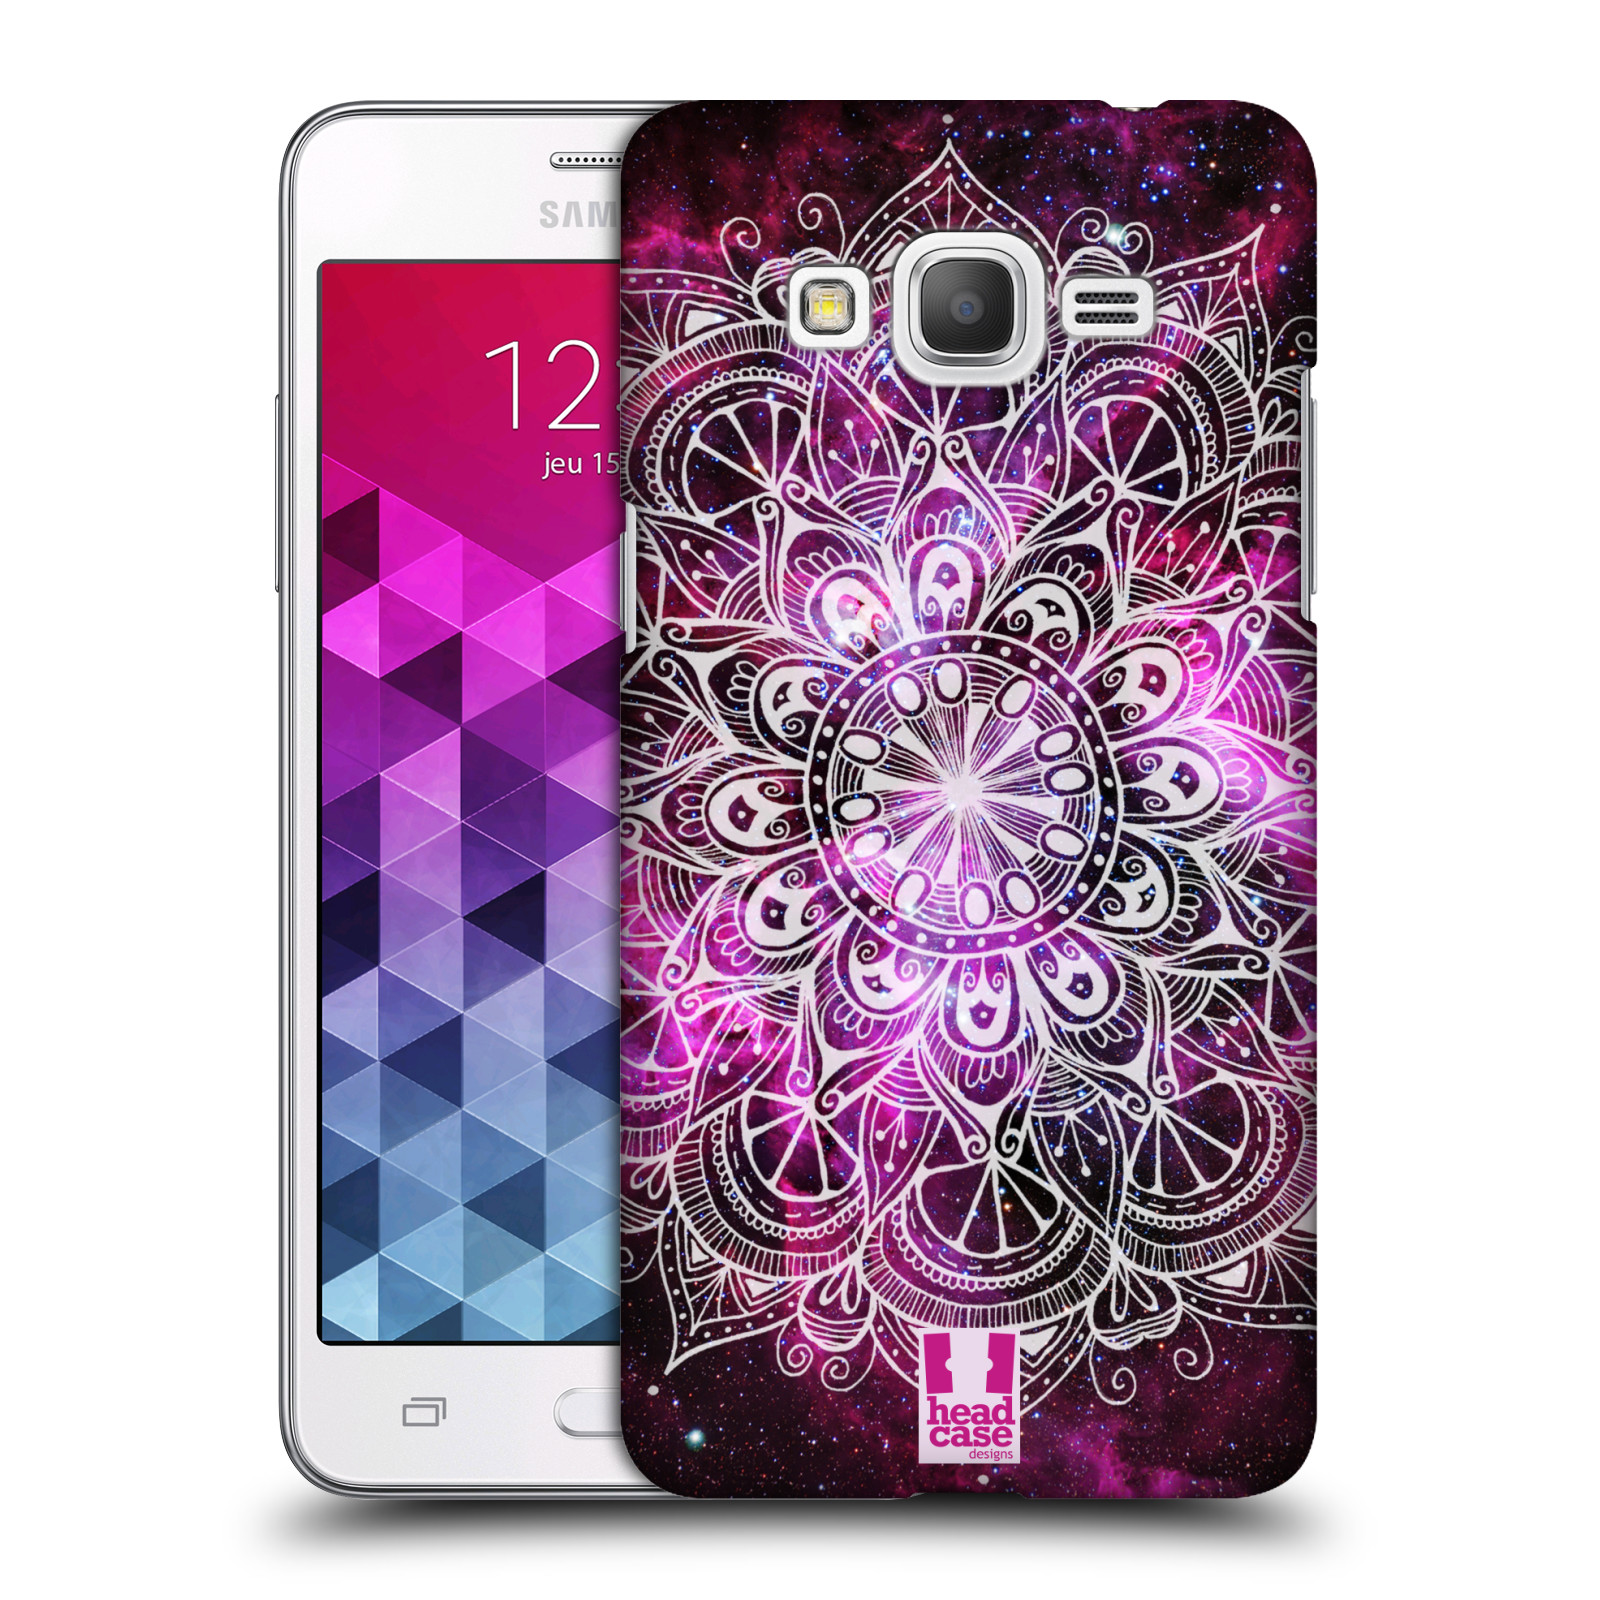 Plastové pouzdro na mobil Samsung Galaxy Grand Prime VE HEAD CASE Mandala Doodle Nebula